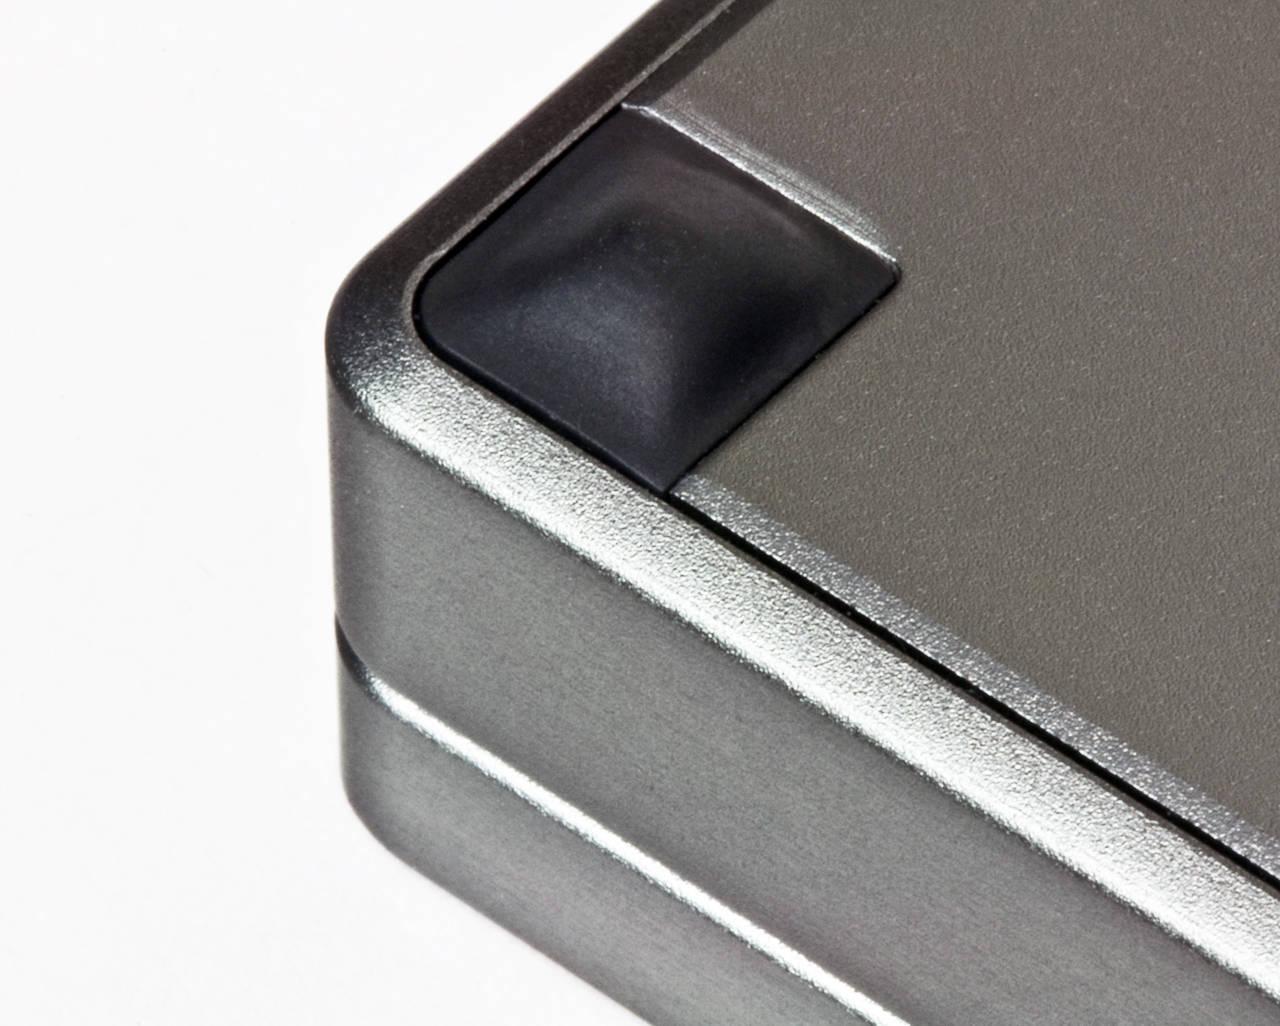 Pixel Chromebook feet